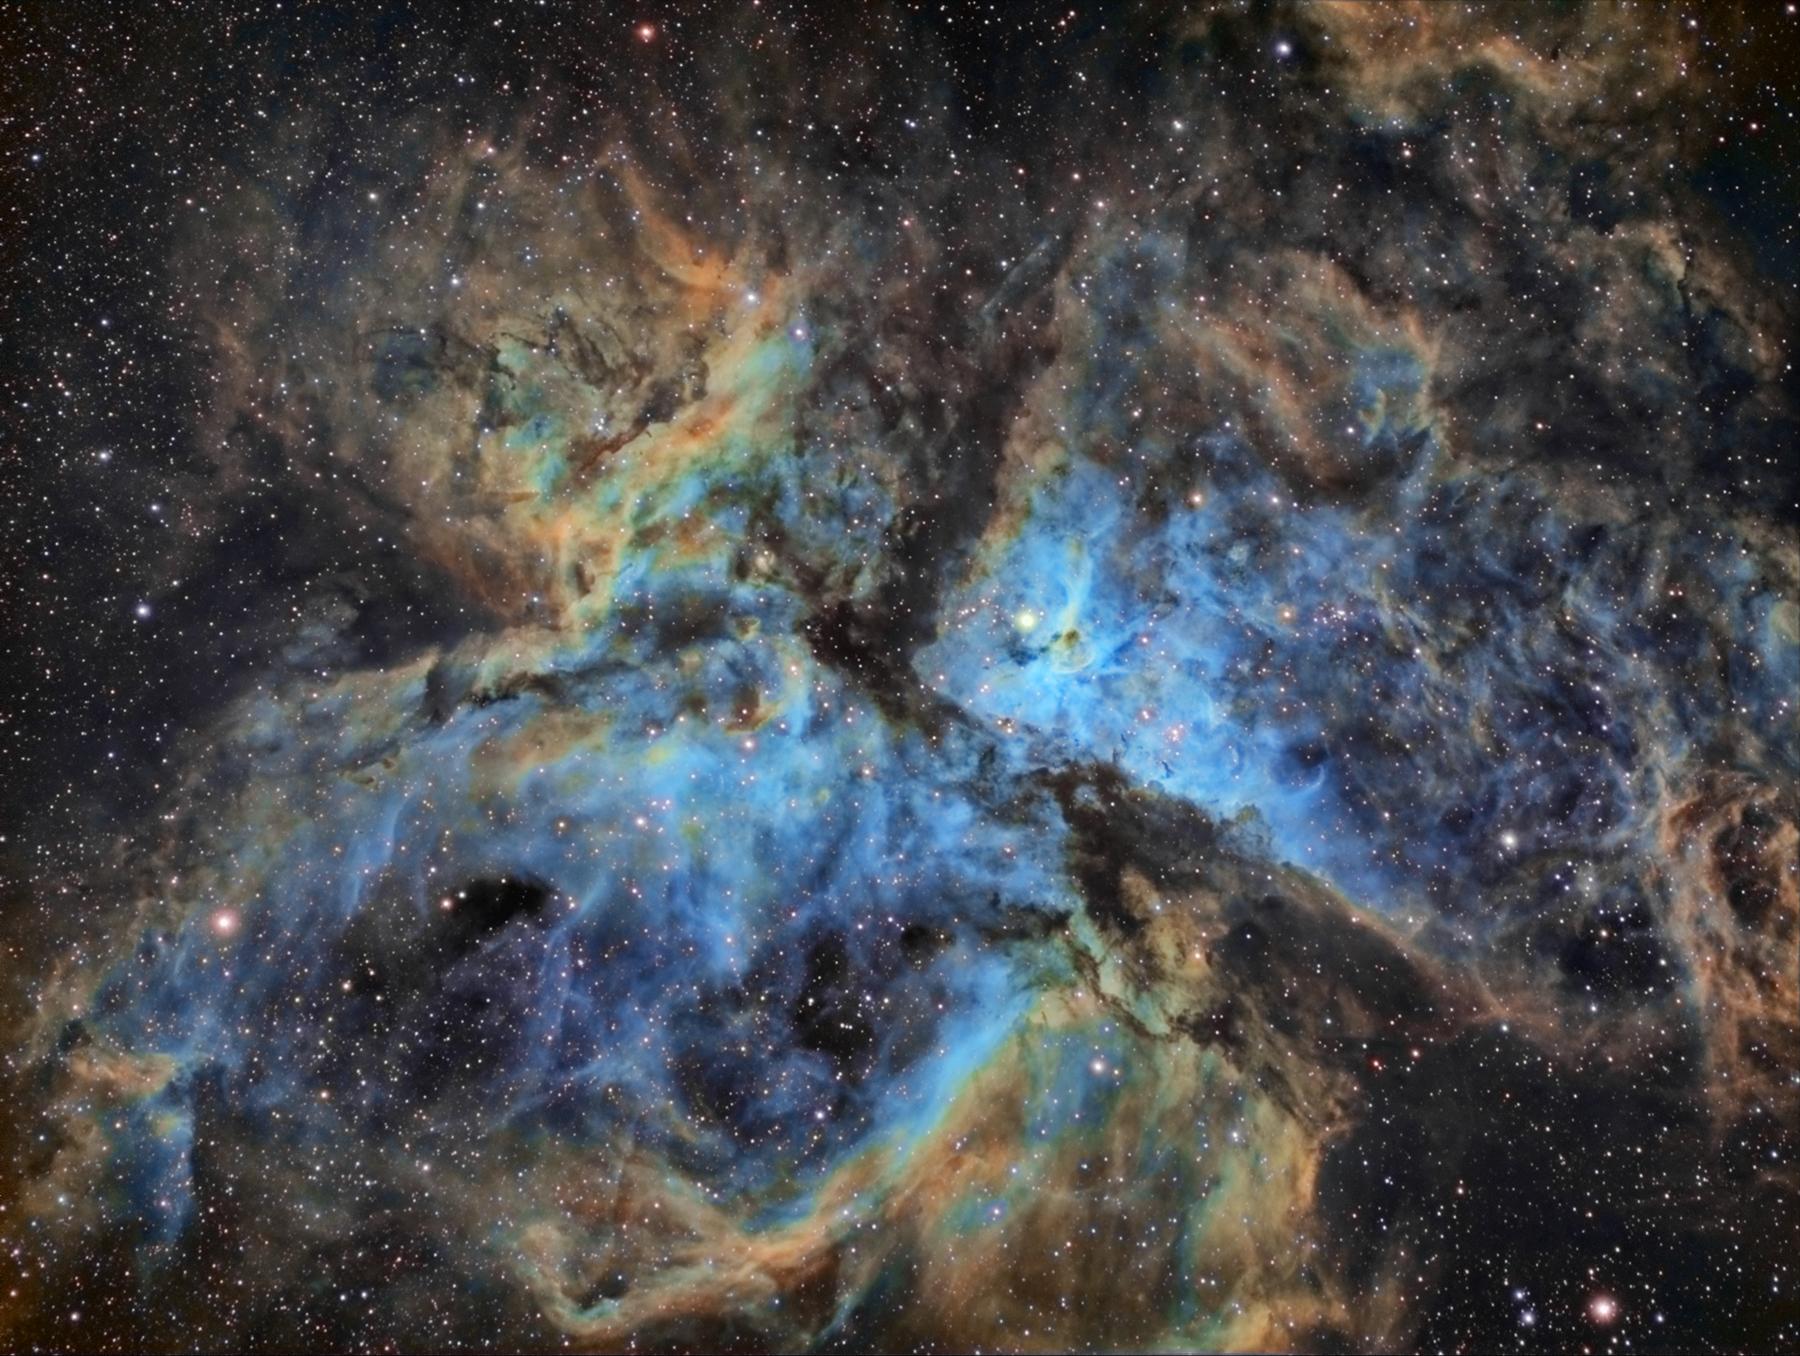 NGC 3372 Carina Nebula